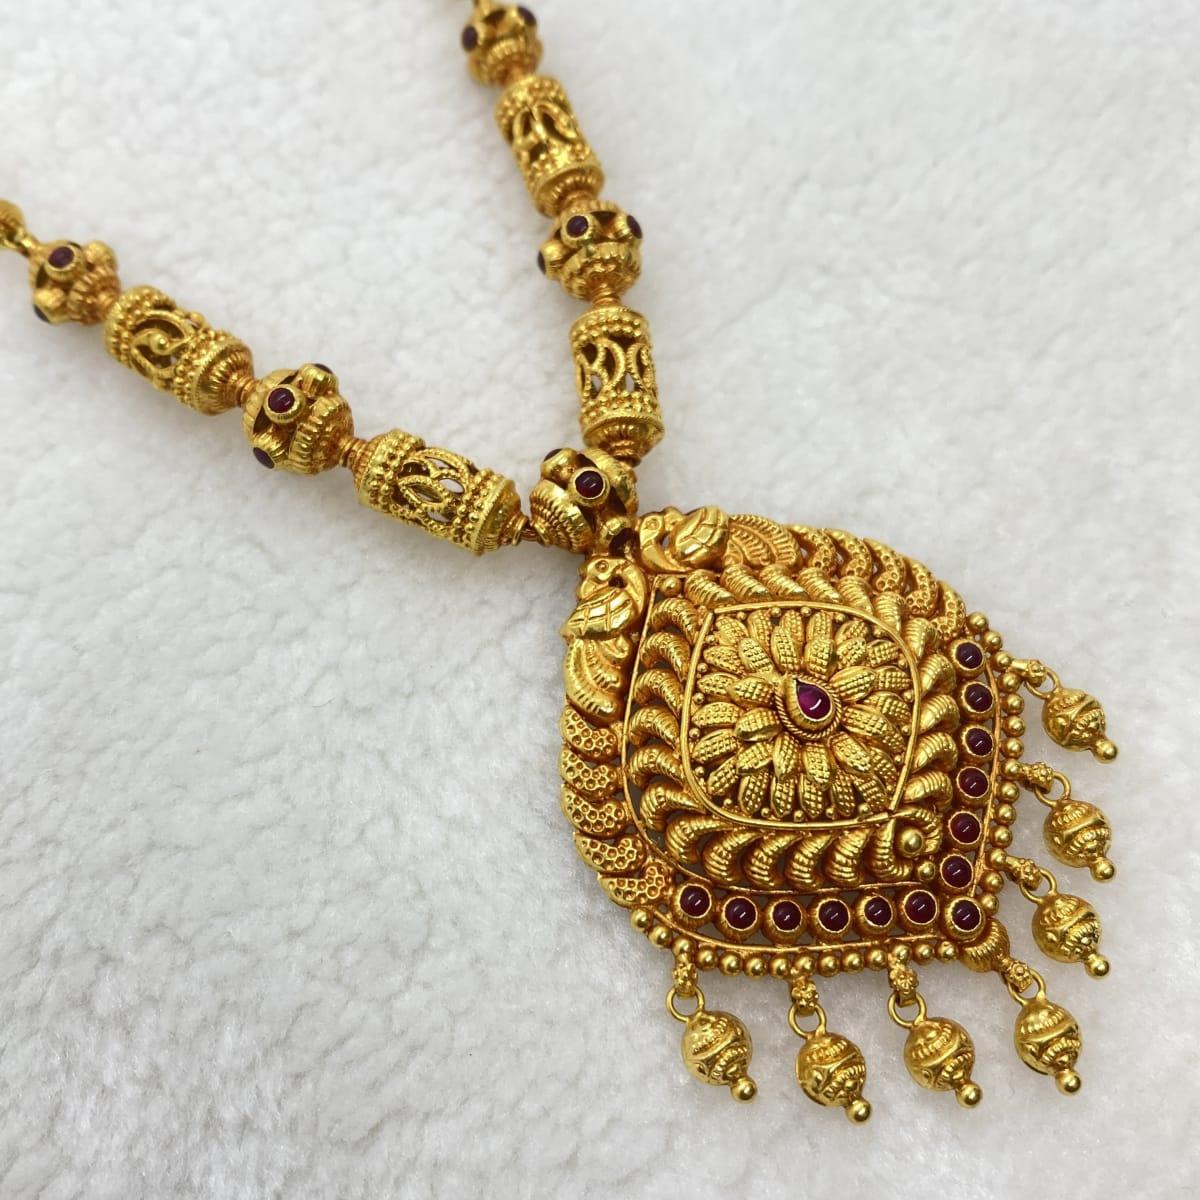 Fancy Antique Gold Design Beed Necklace Gj0024